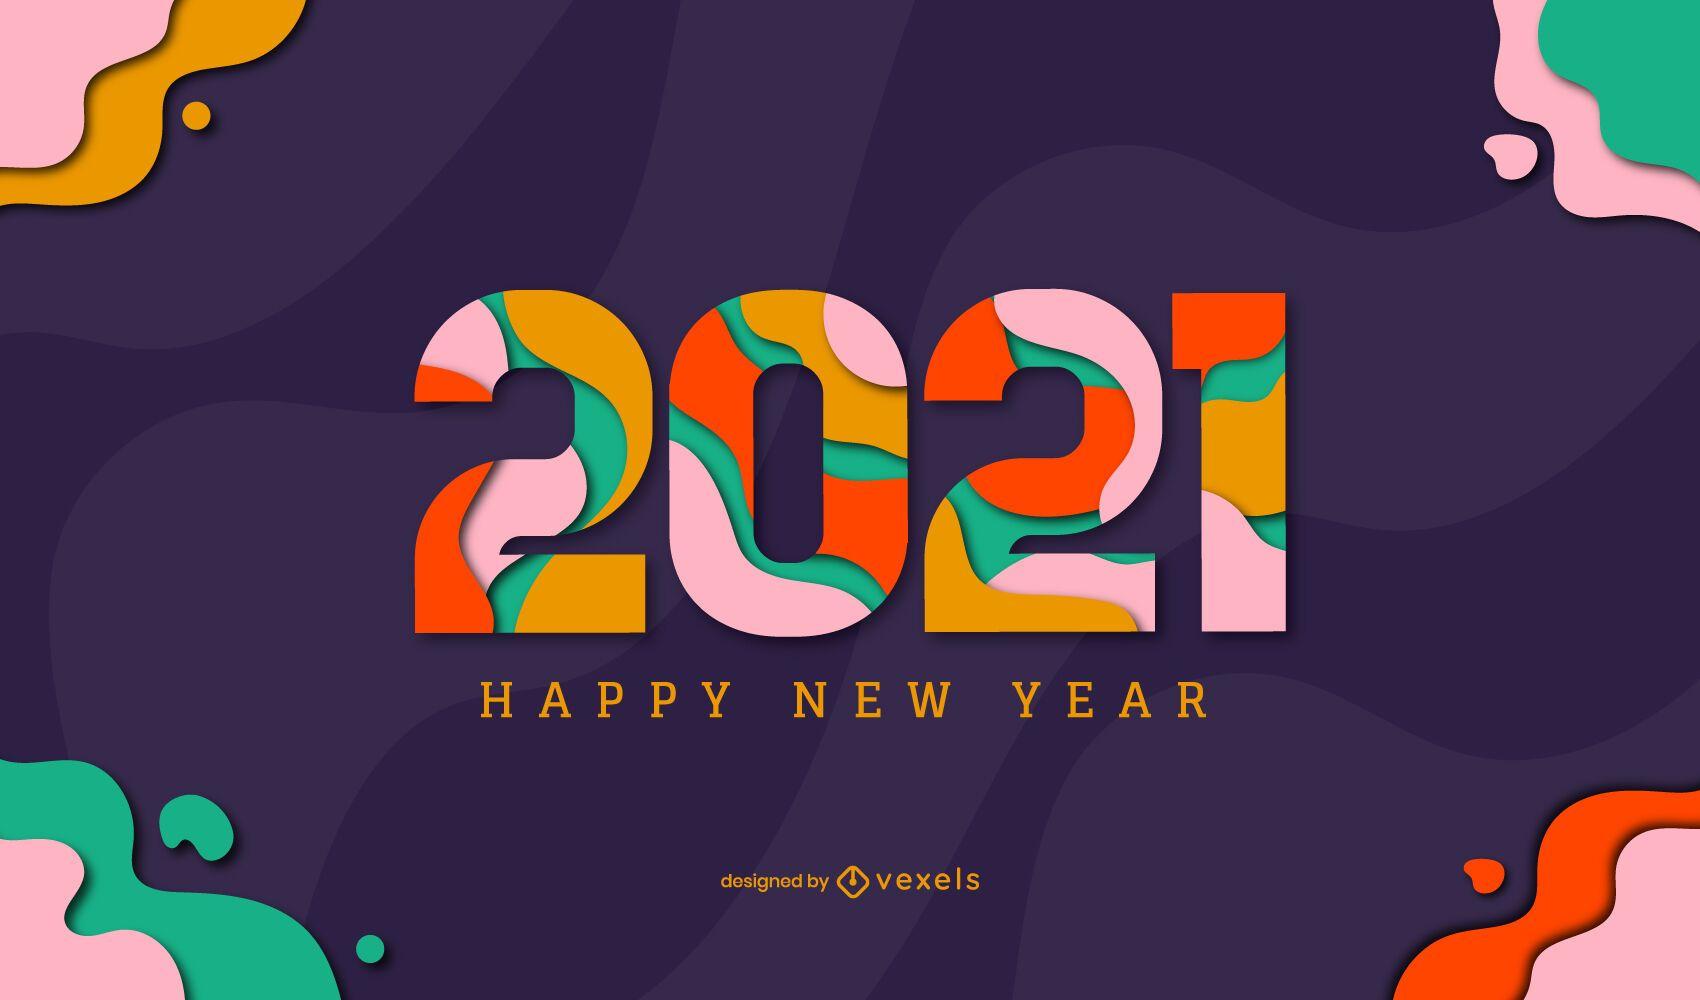 Happy new year 2021 illustration design